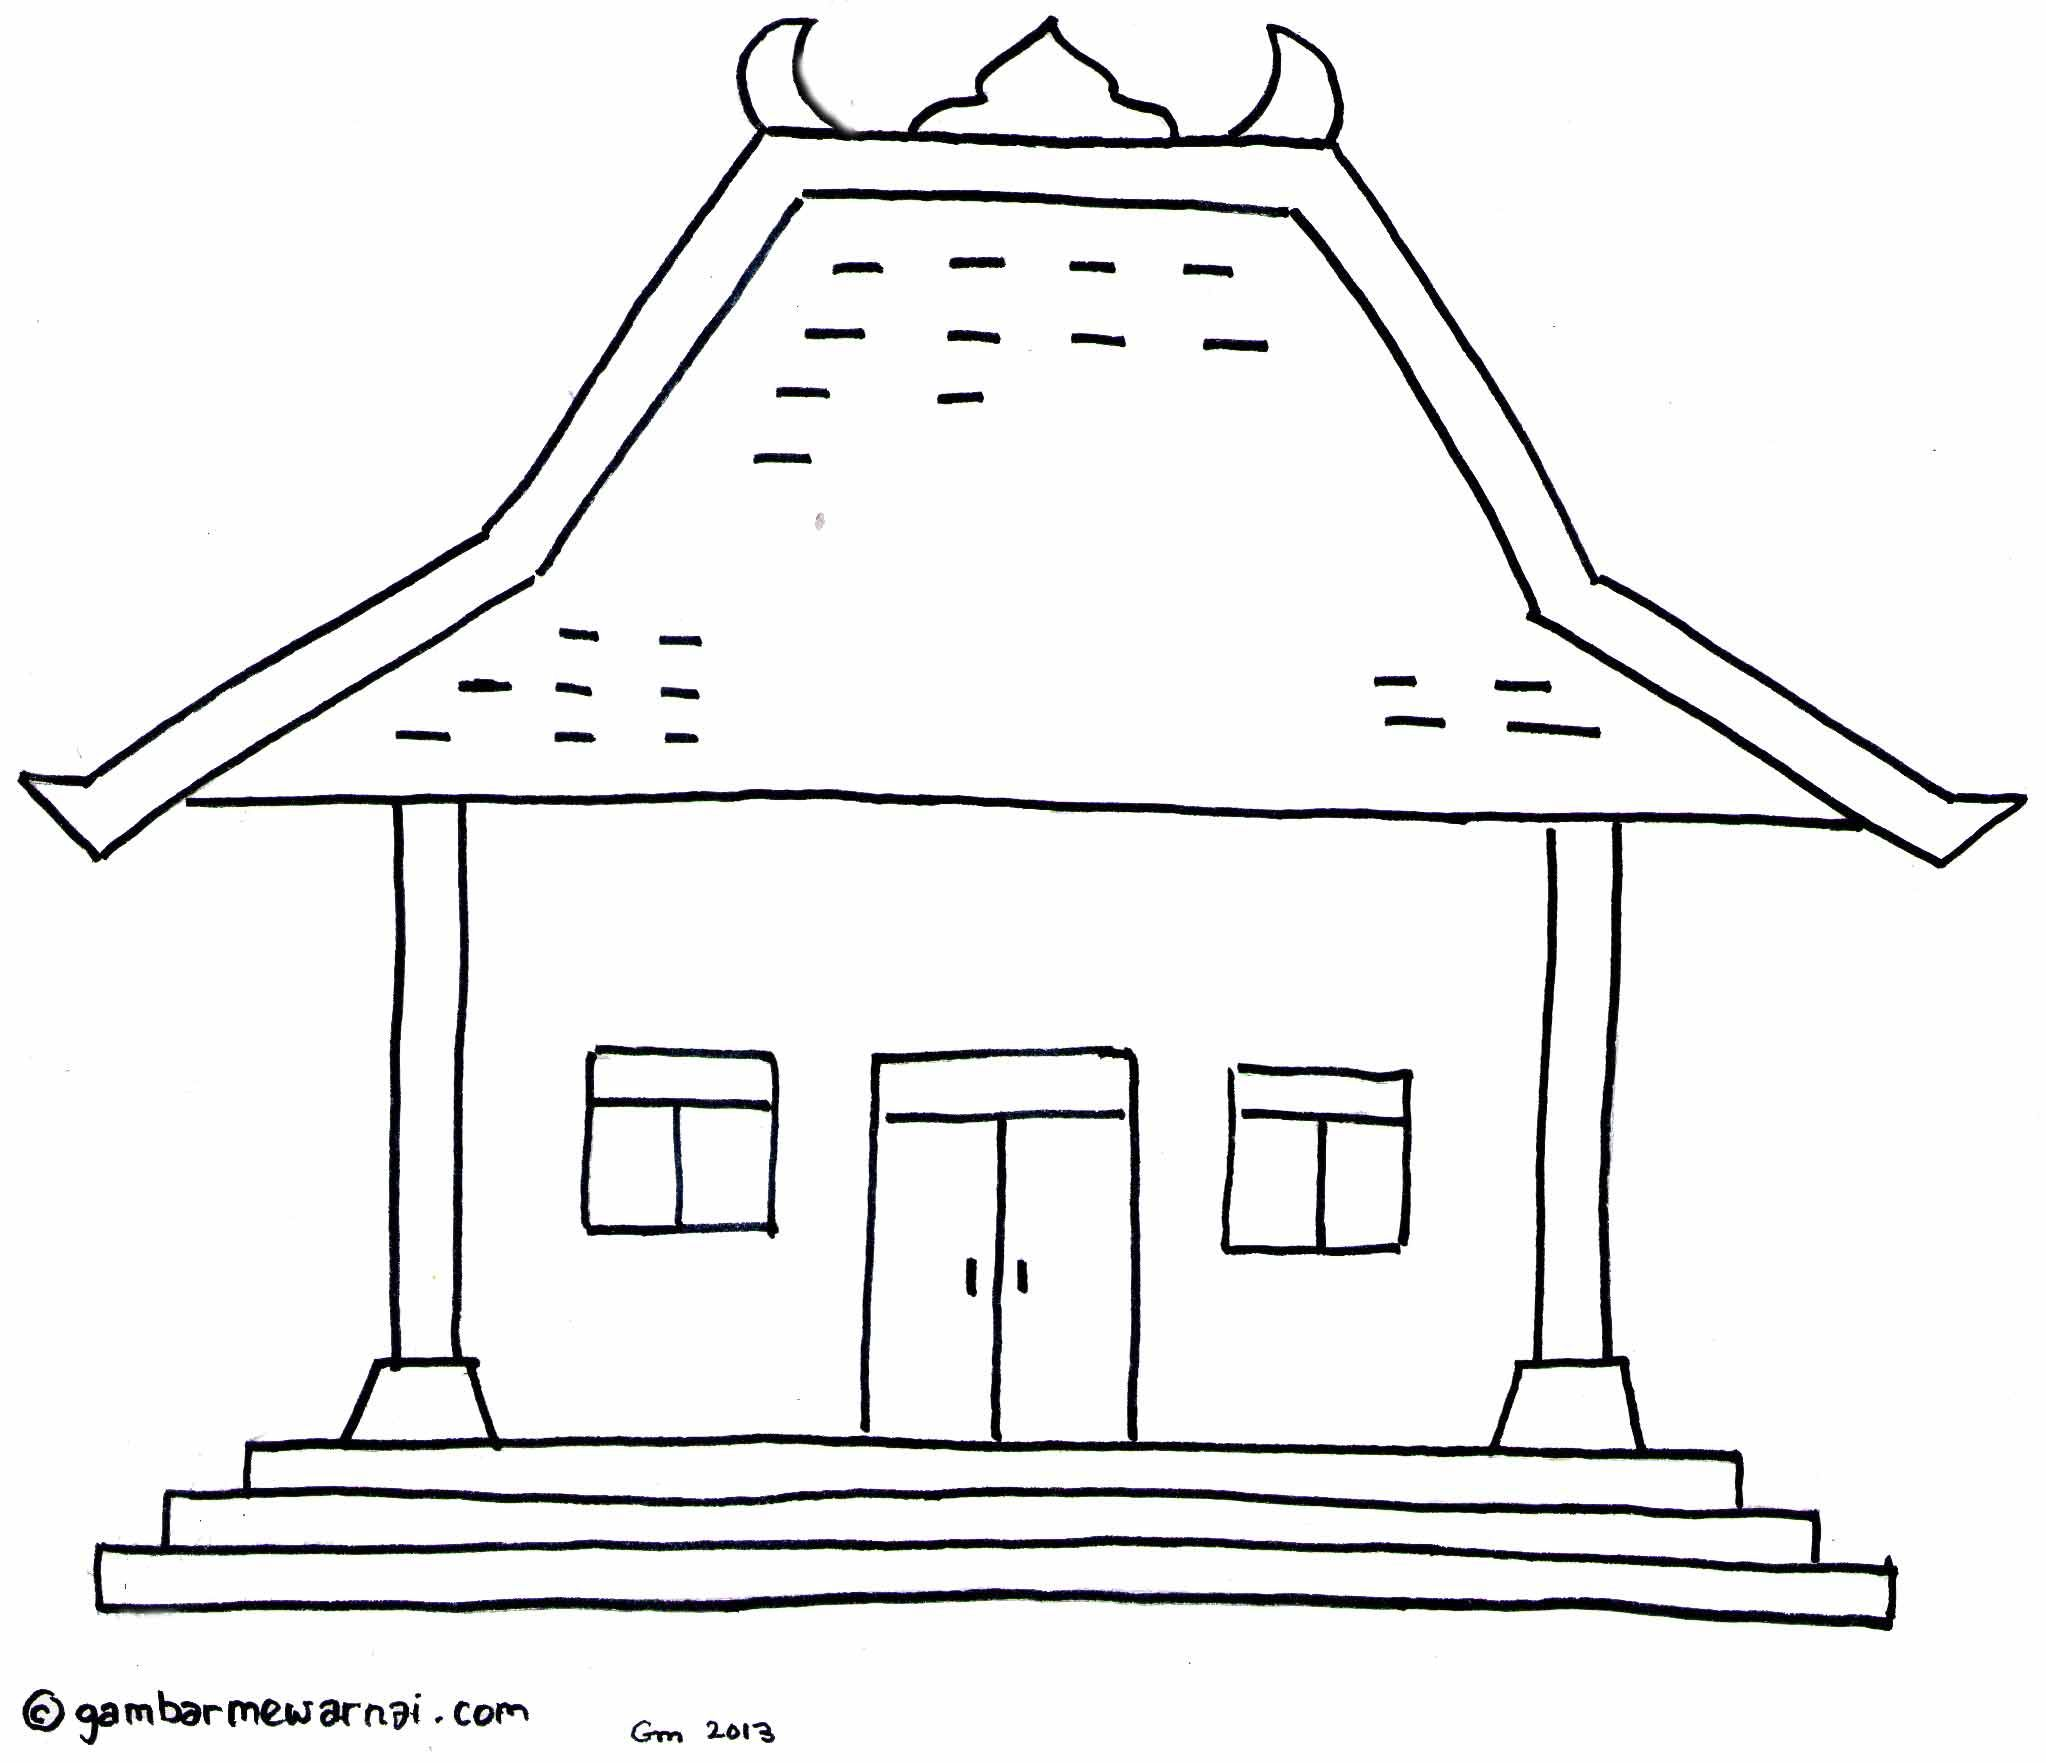 Gambar Mewarnai Rumah Adat Rumahku Pinterest Yogyakarta